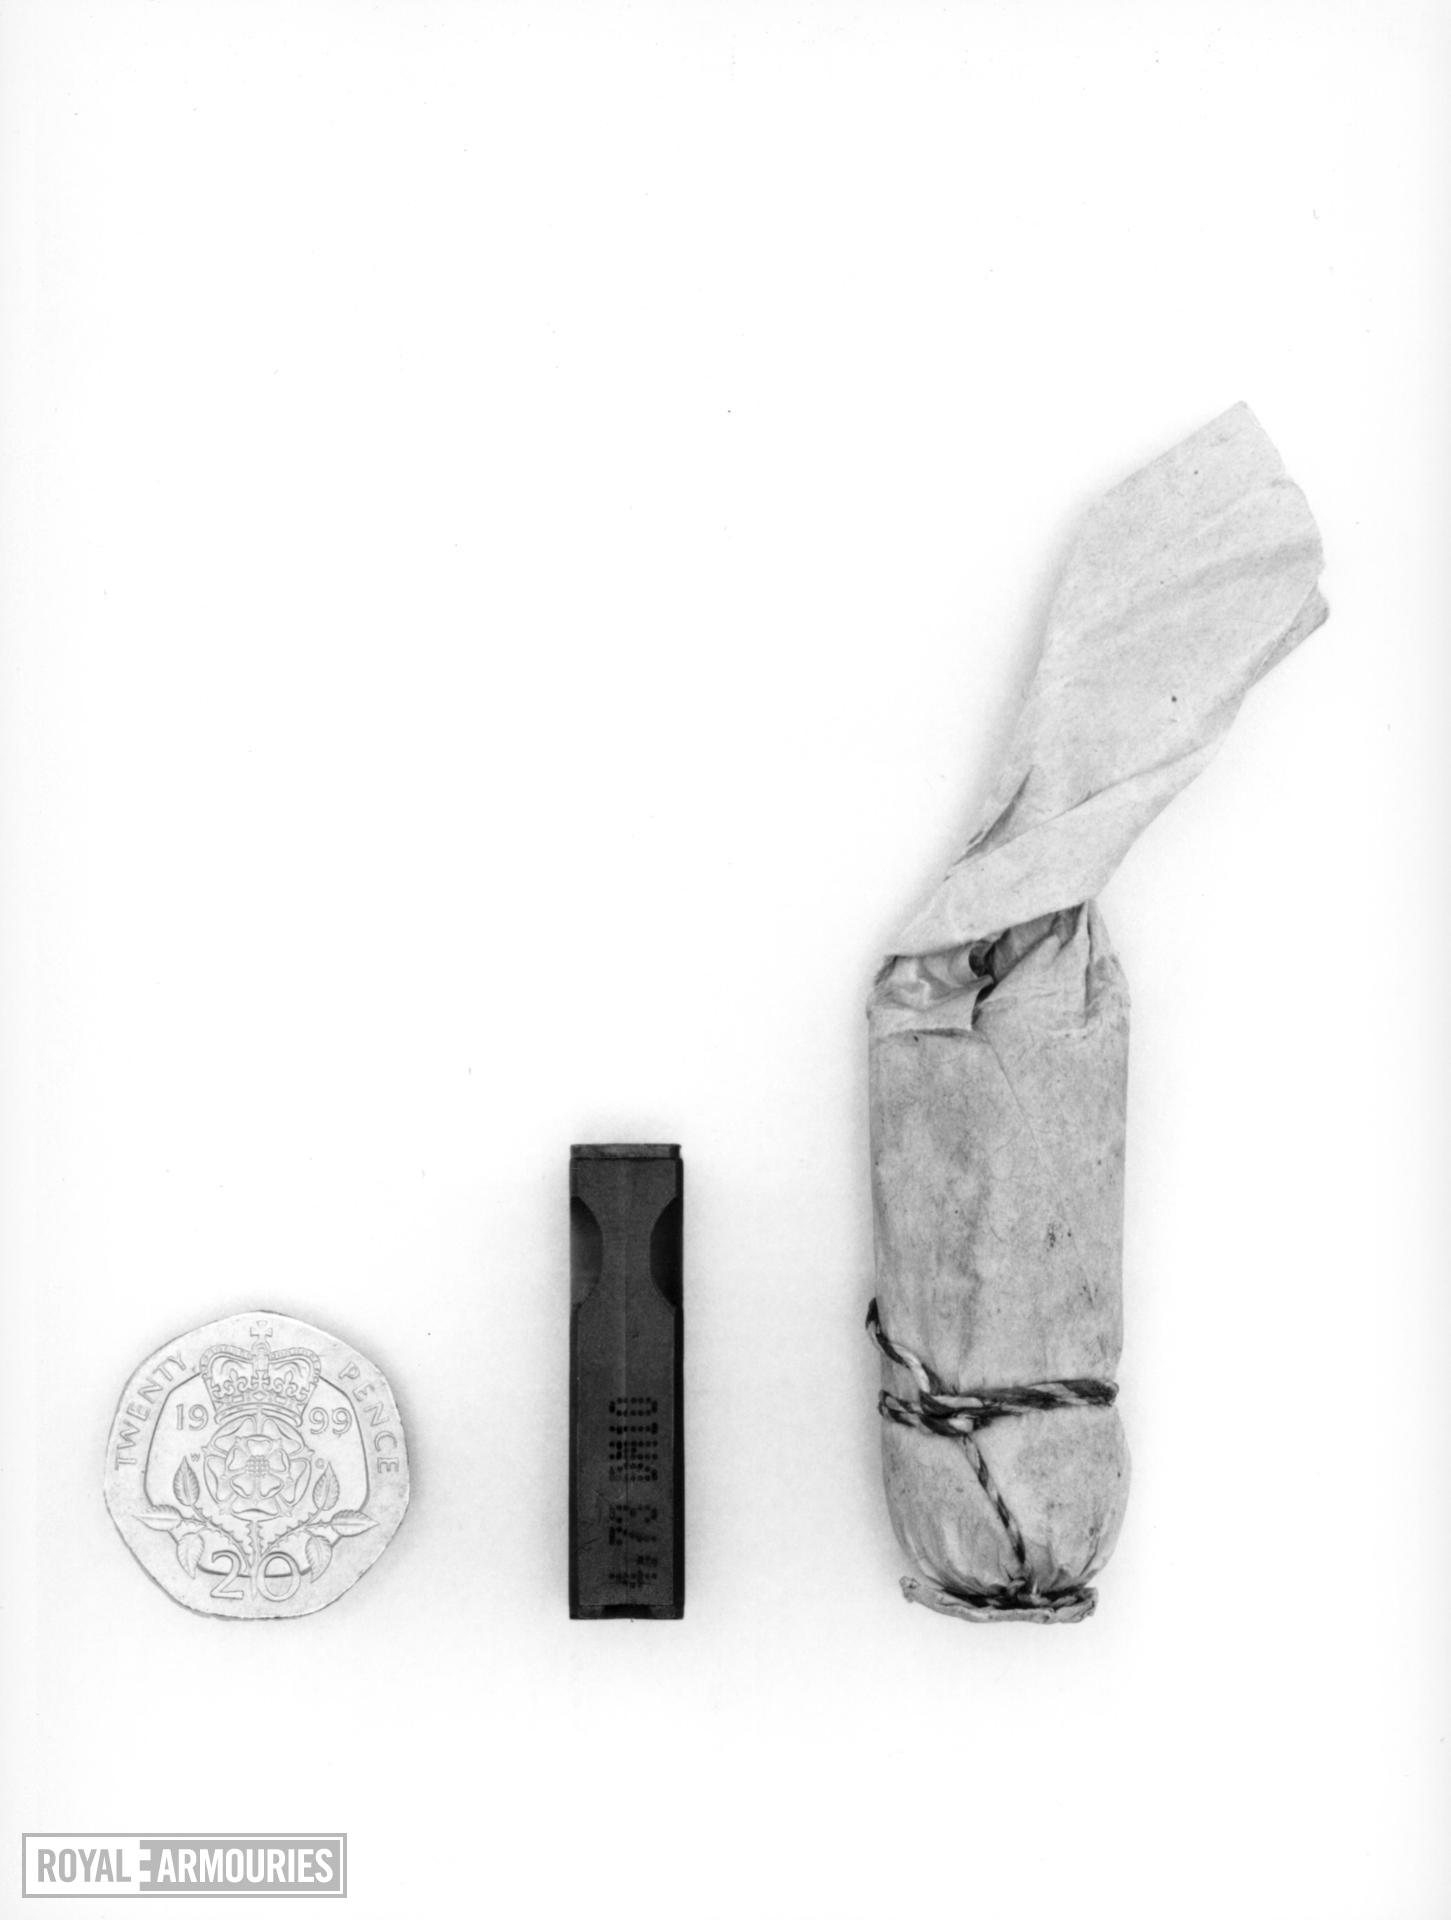 Paper pistol cartridge - .68 in Percussion Pistol